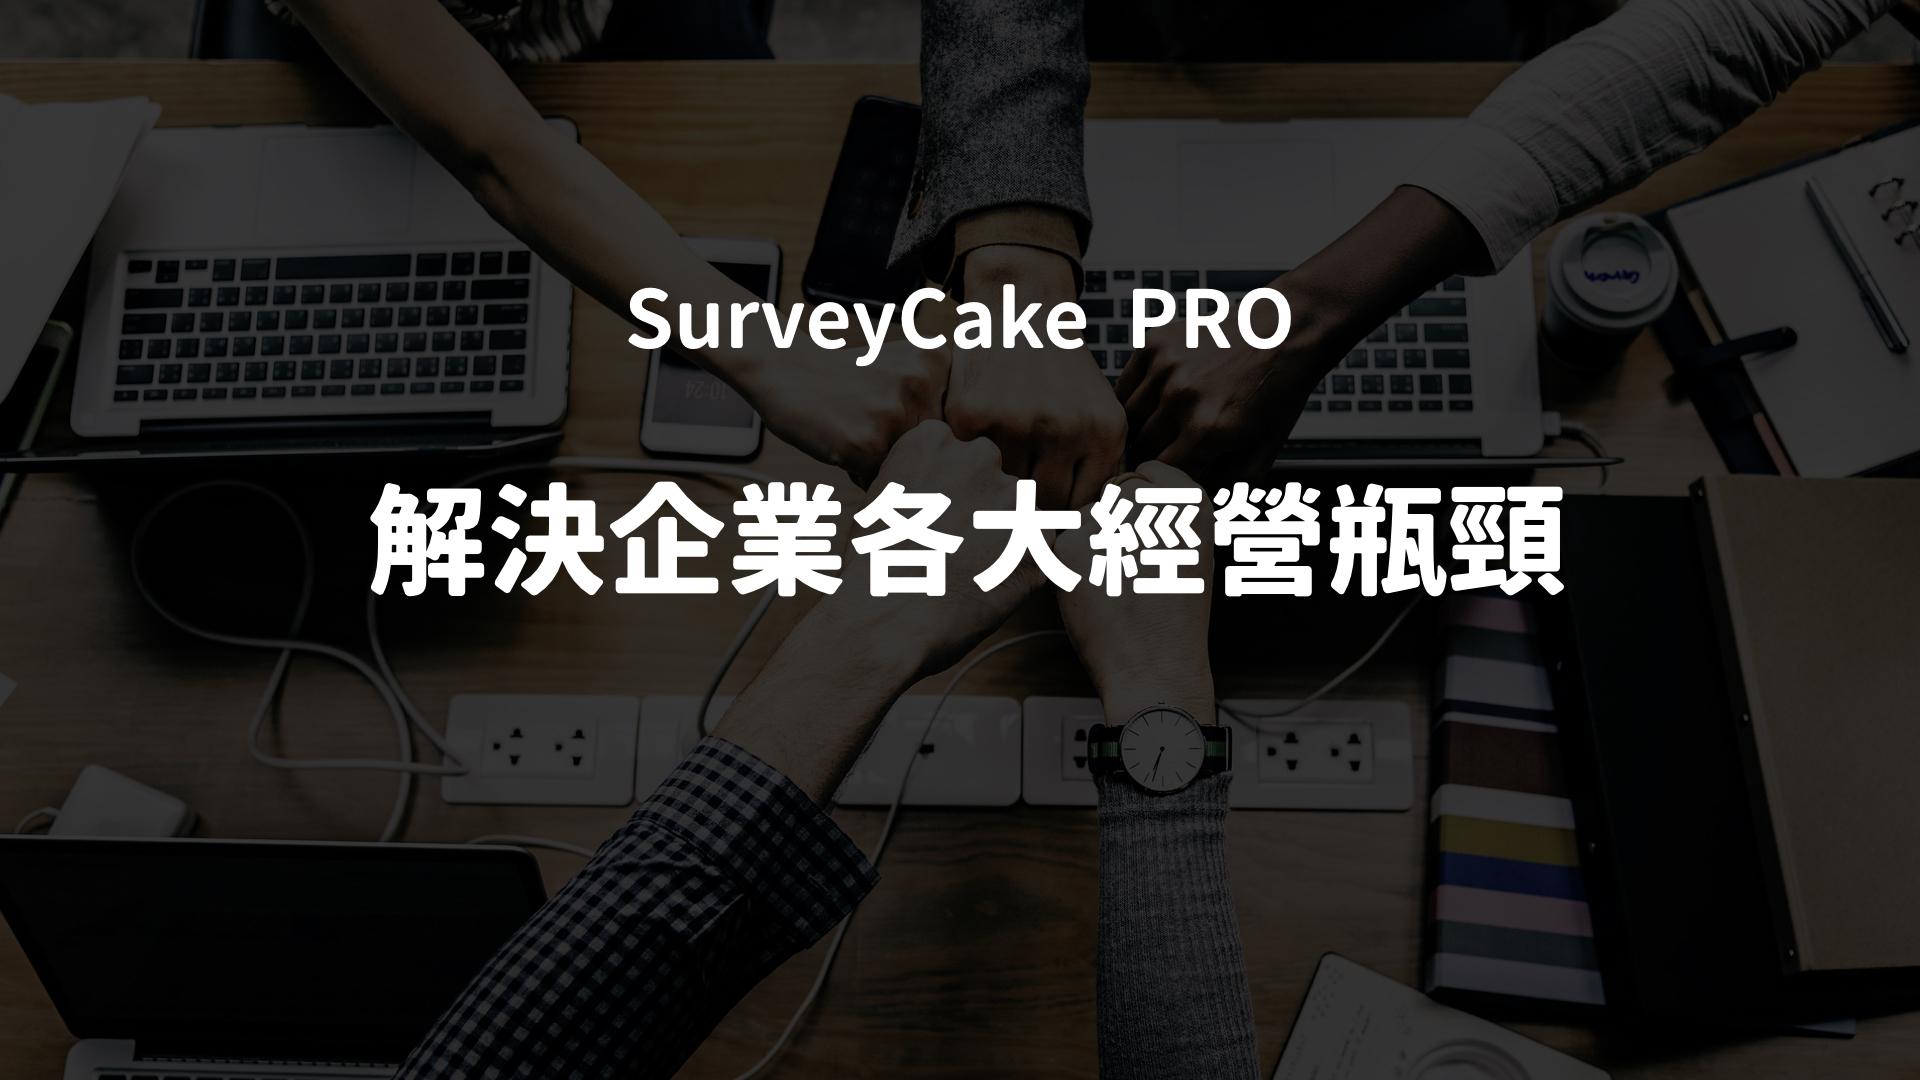 [ PRO ] 企業必備!解決行銷、客服、管理等企業難題